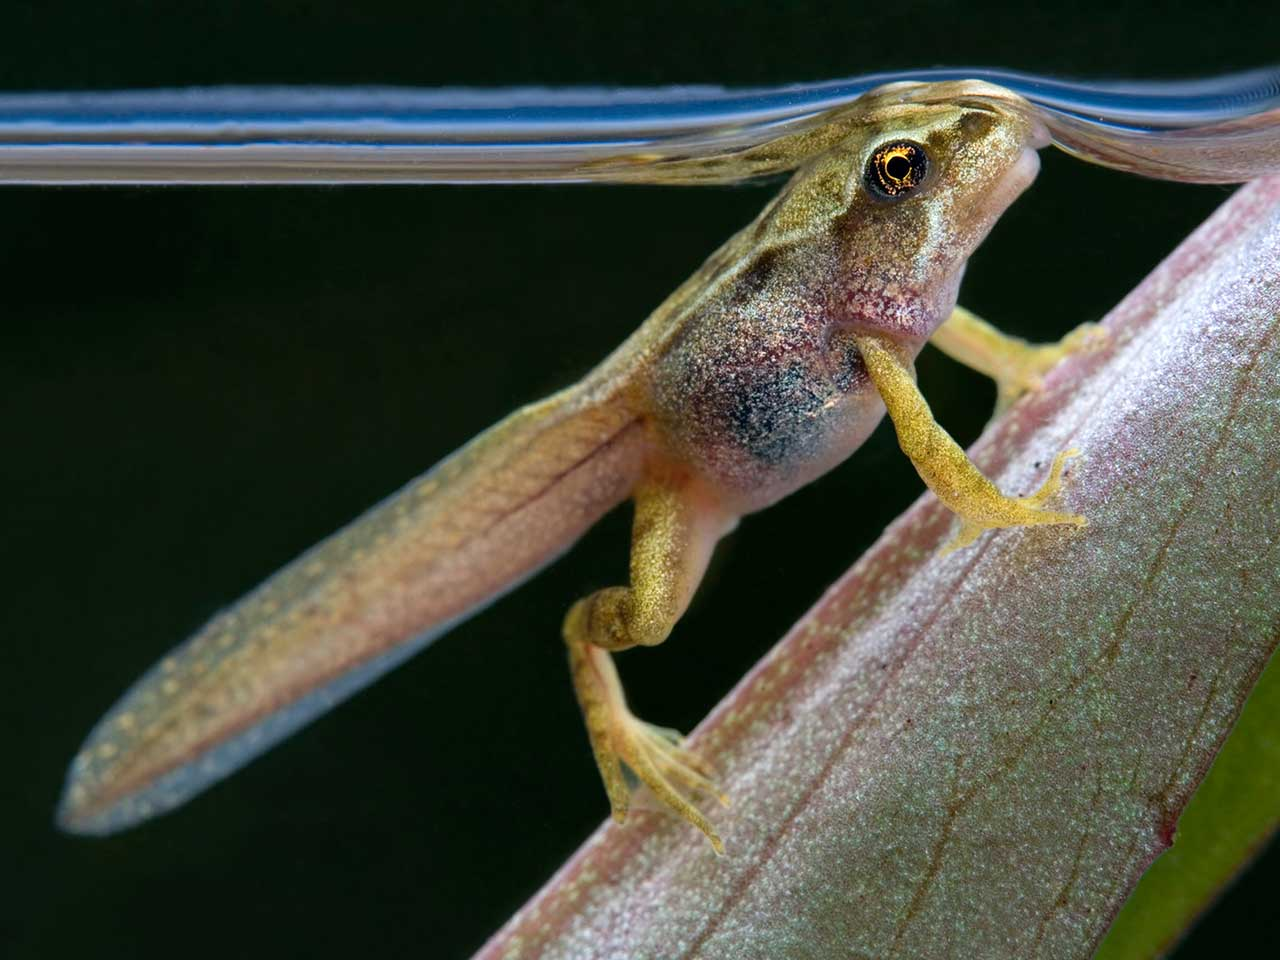 Tadpole to frog: development stages & metamorphosis - Saga